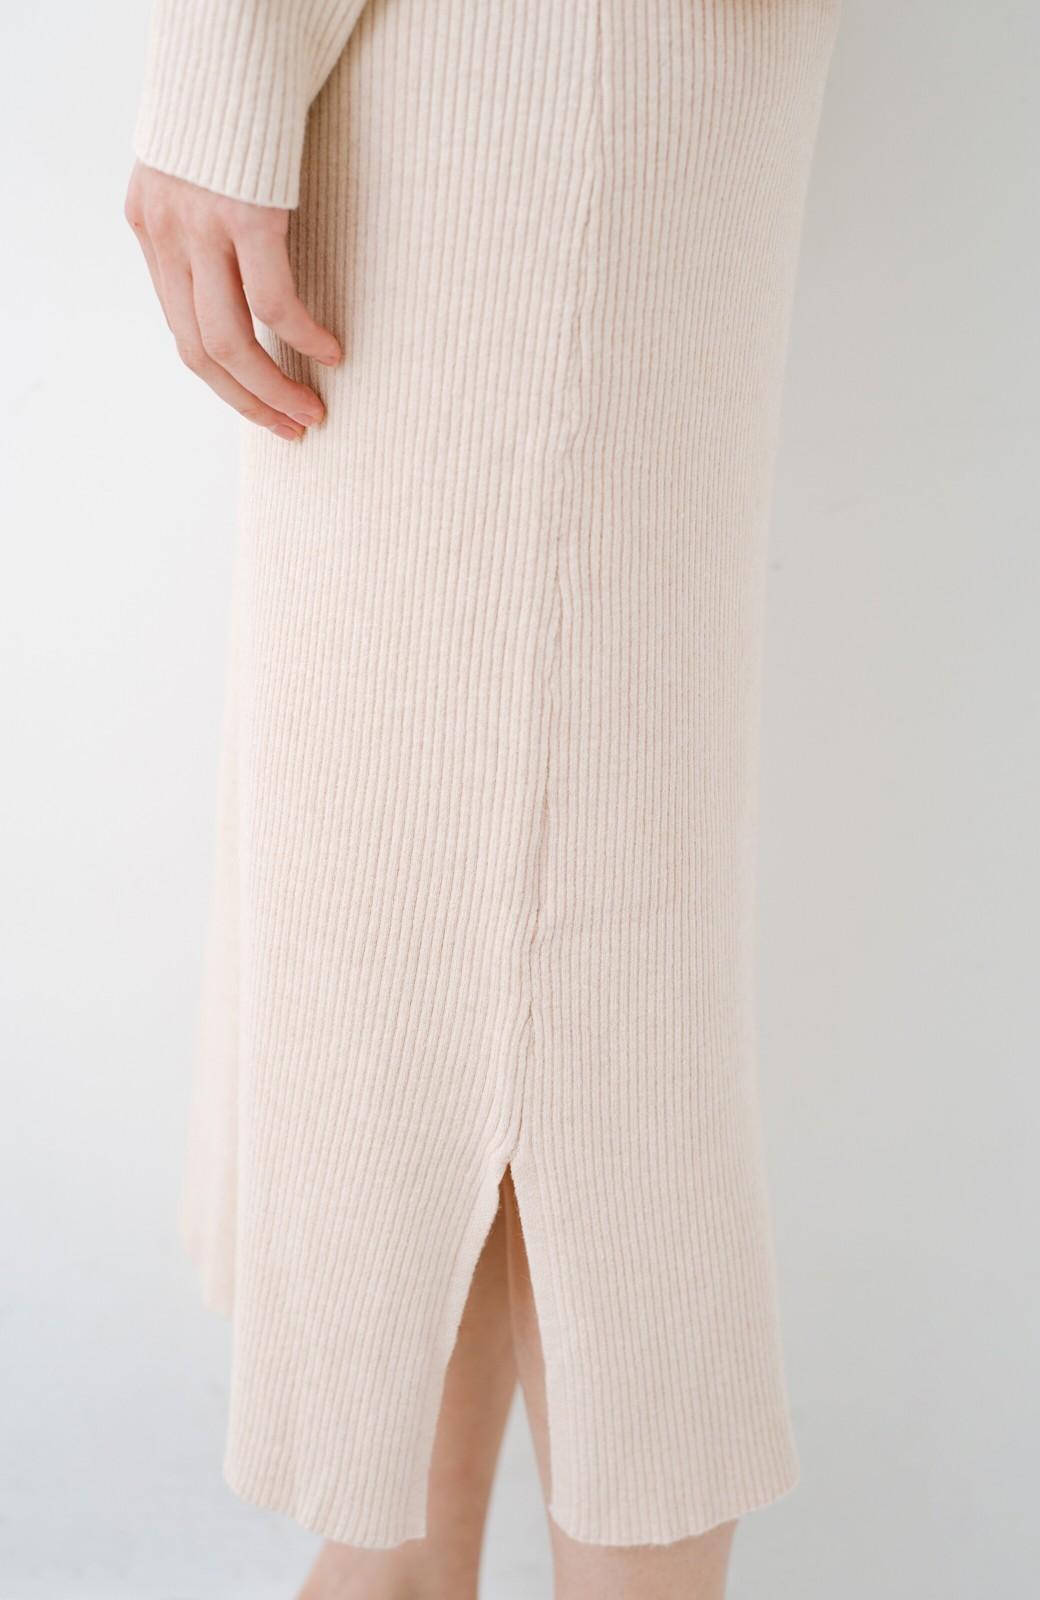 haco! ニットワンピースとキャミソールを重ねて着るだけでパッとオシャレに見えるうれしいセット by style zampa <ライトベージュ>の商品写真5